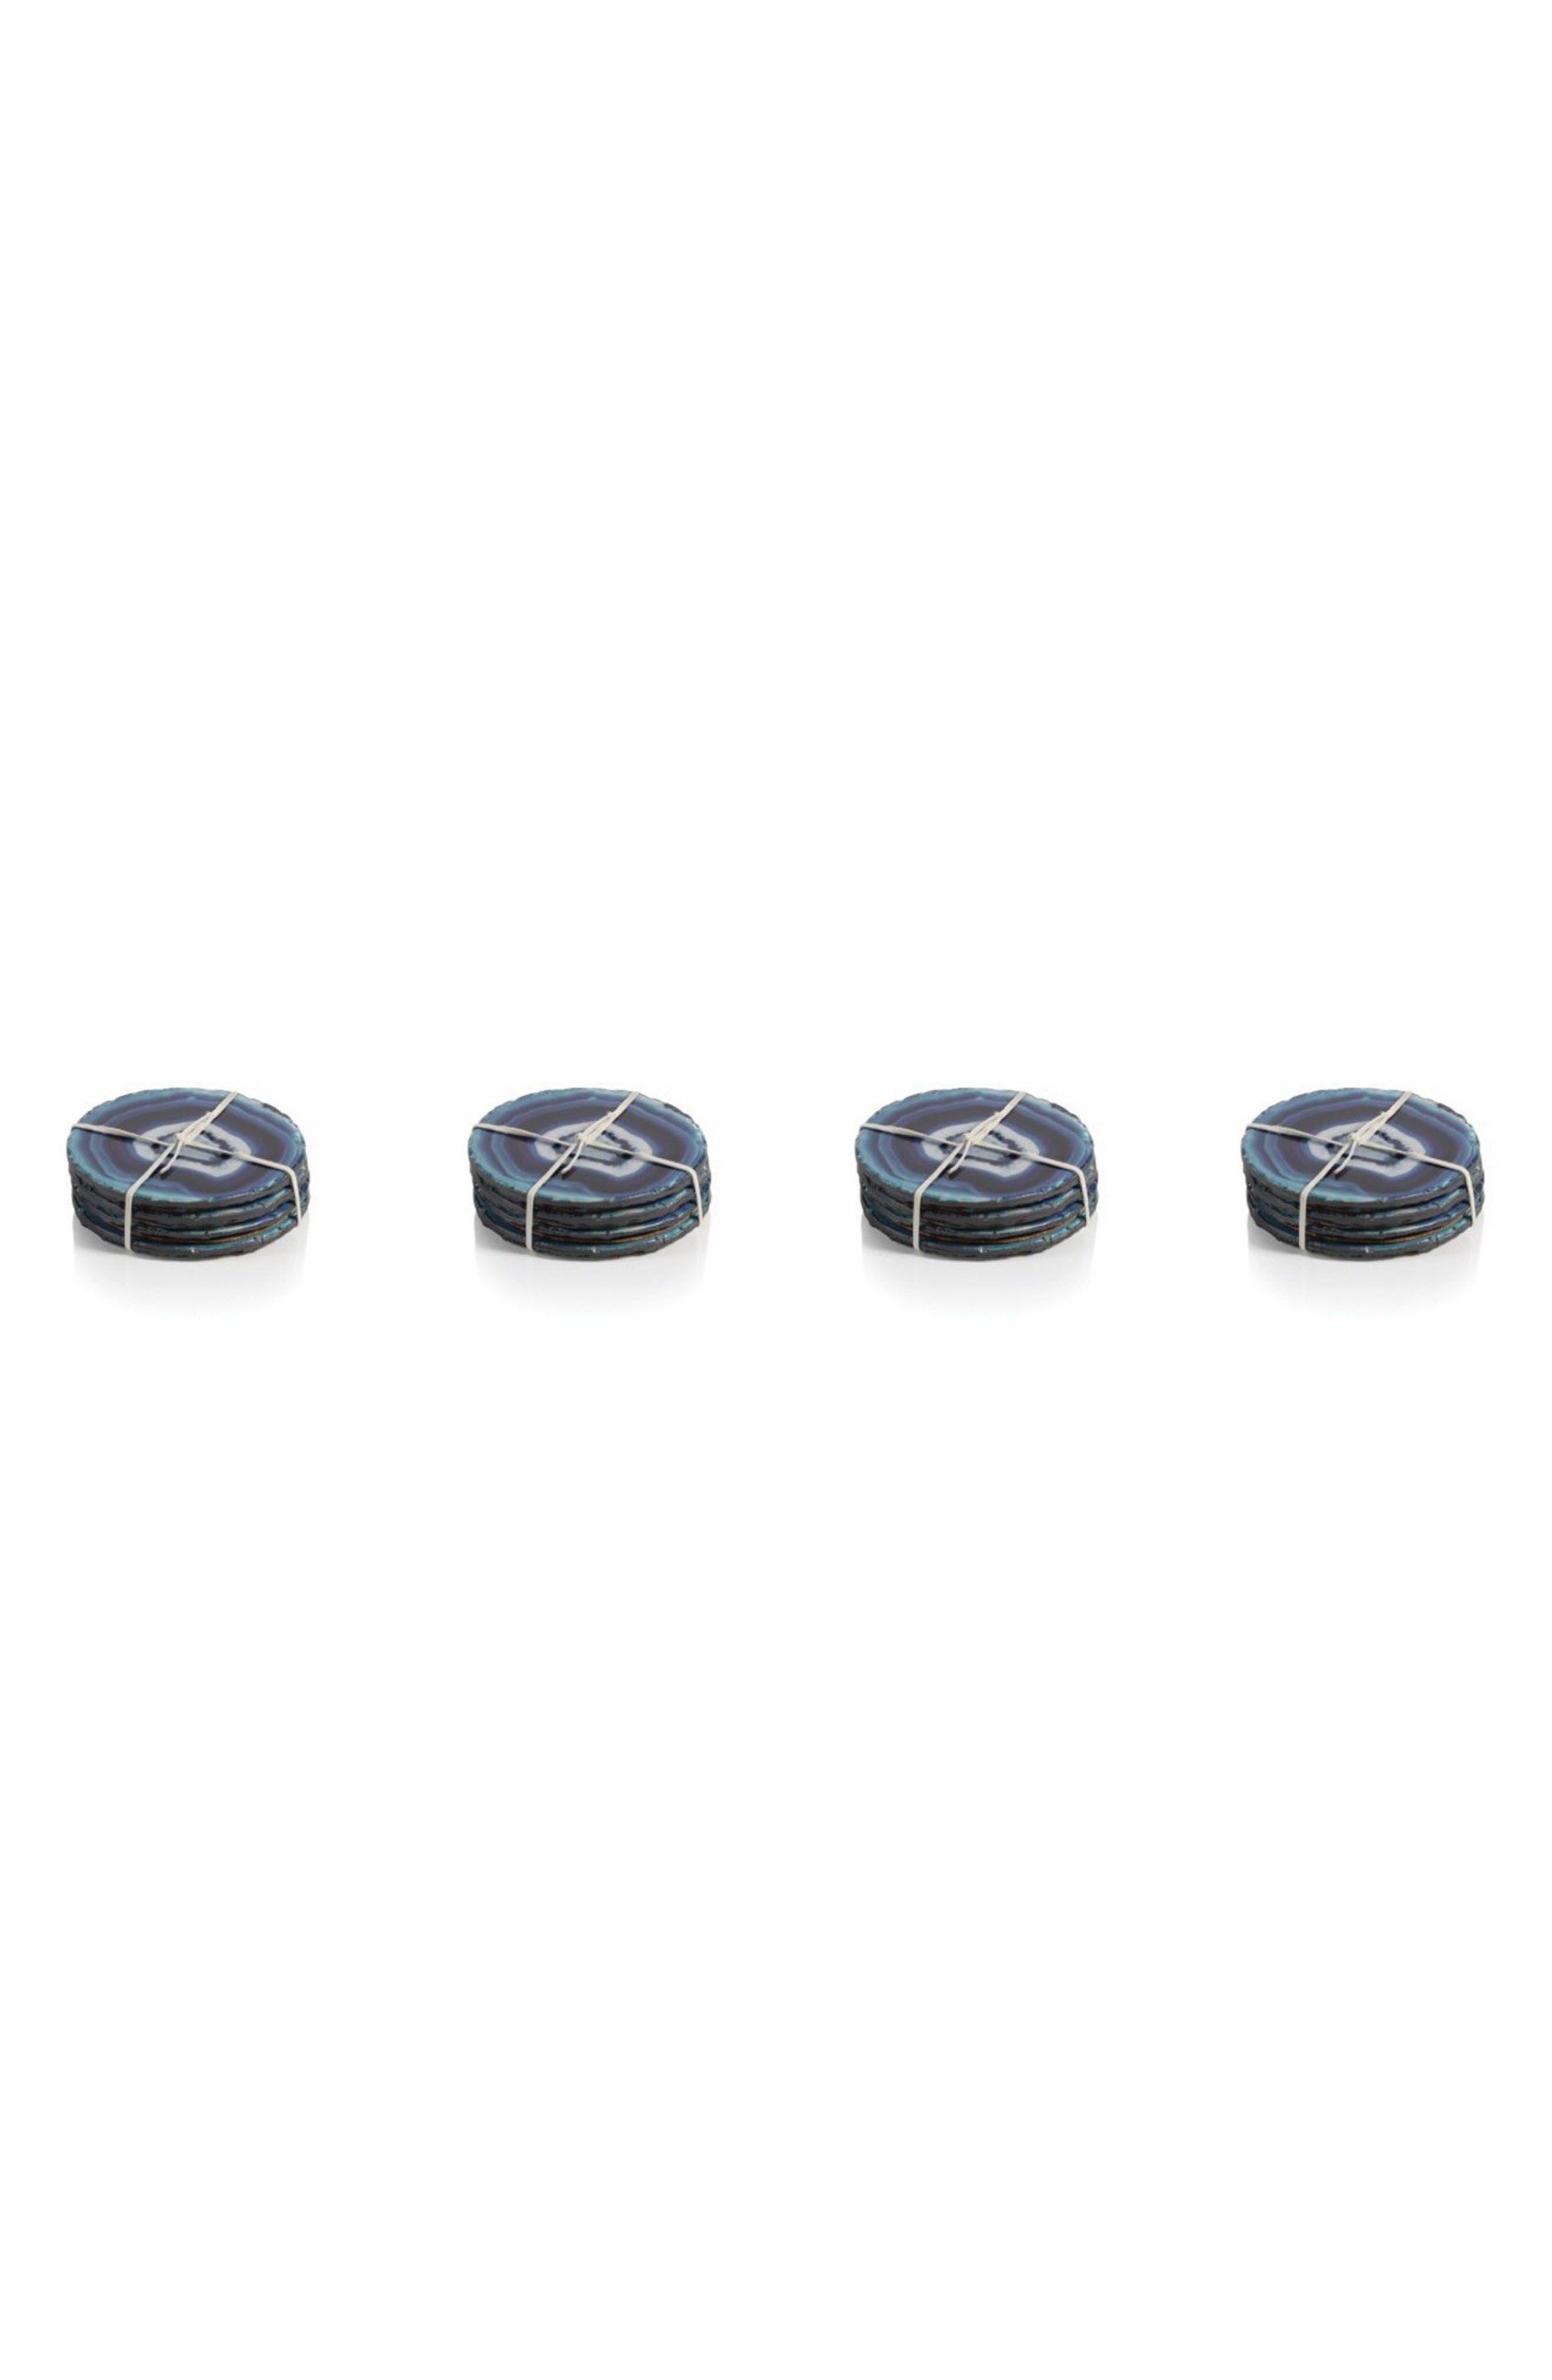 Alternate Image 1 Selected - Zodax Aesir Set of 16 Coasters